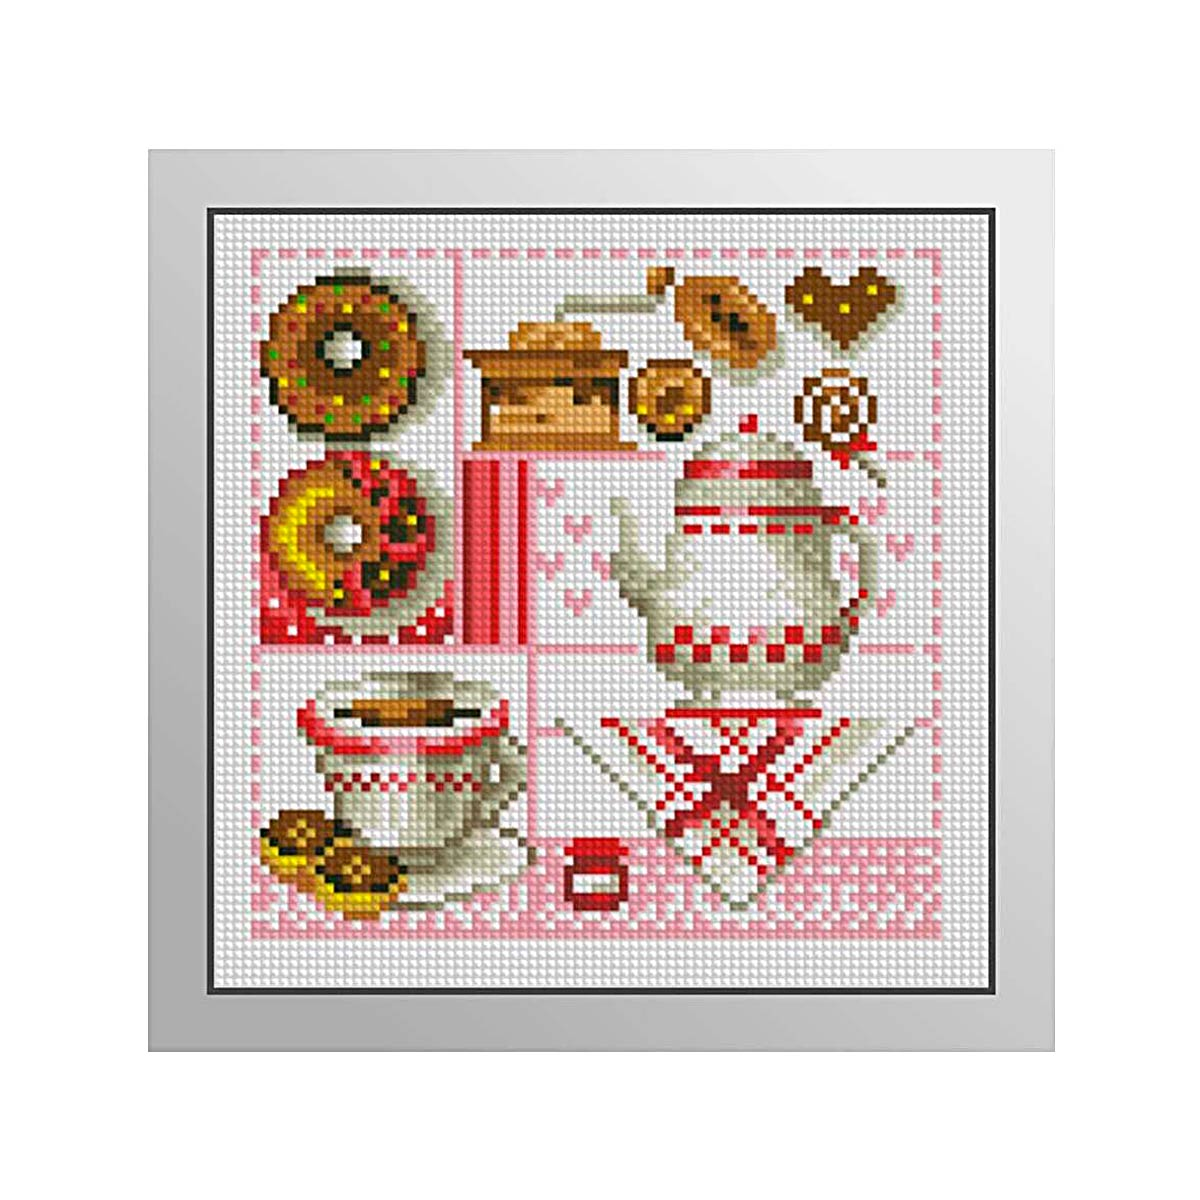 7452 Мозаика Cristal 'Кухня', 19*19 см